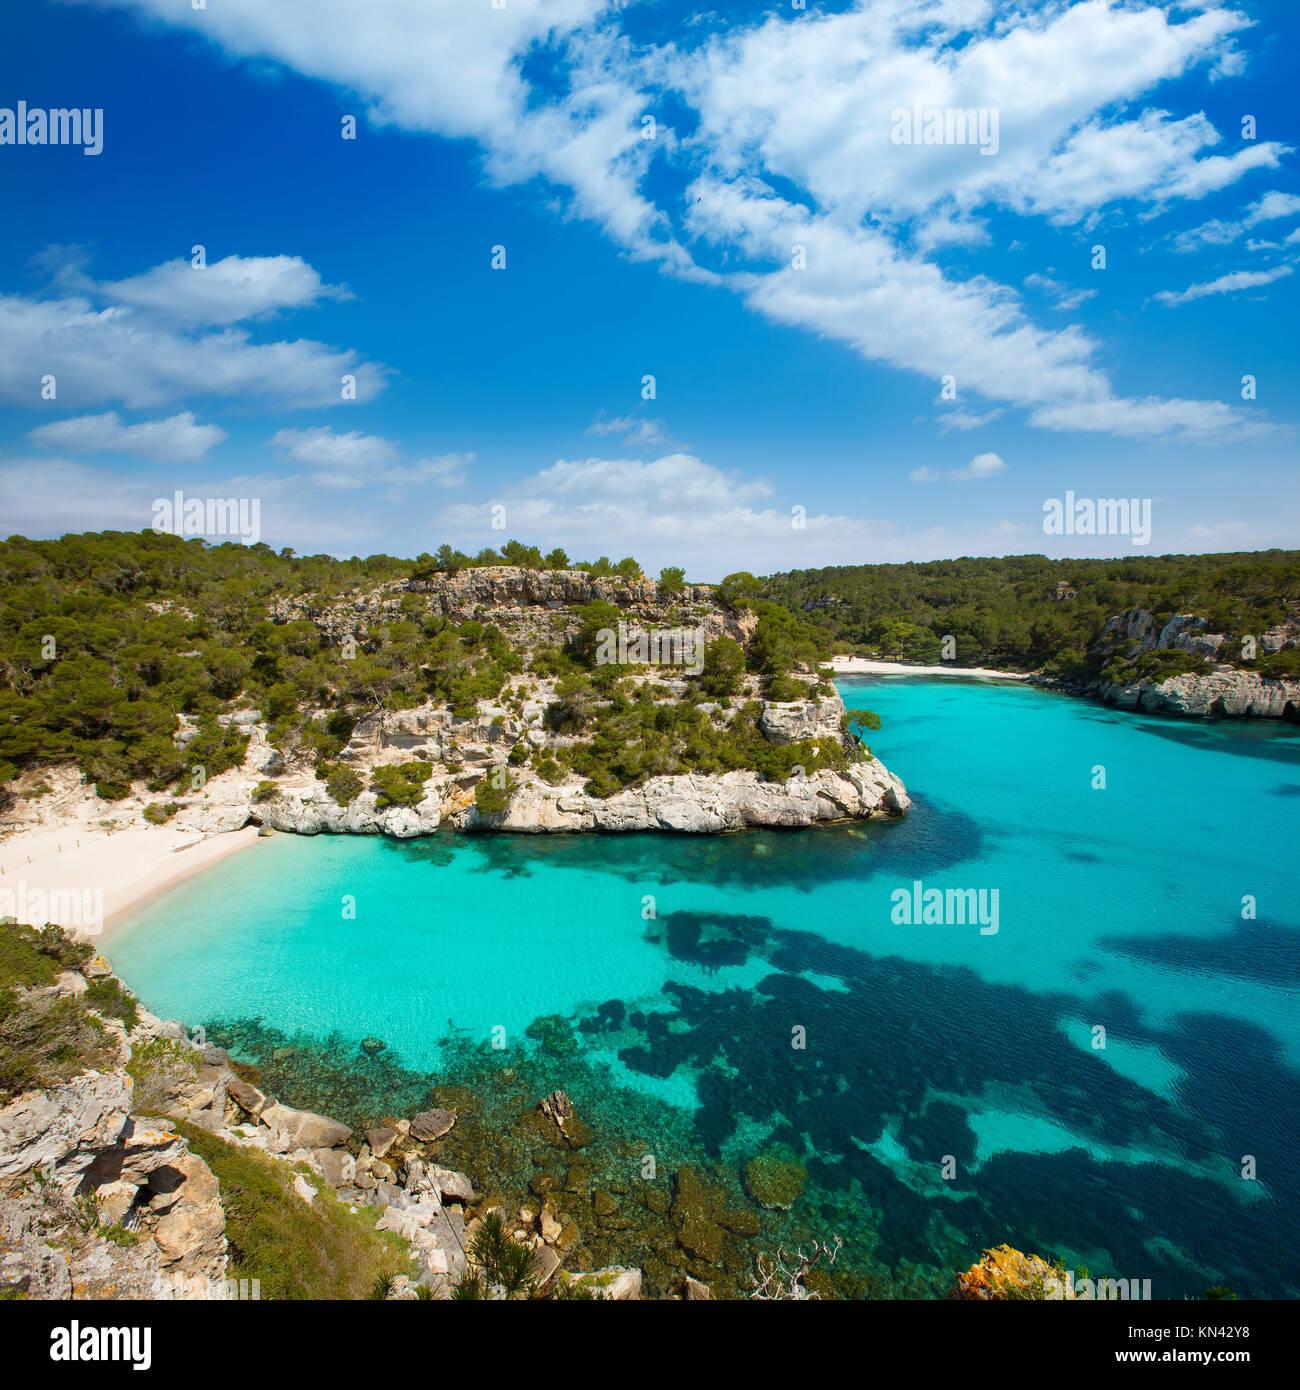 Cala Macarelleta in Ciutadella Menorca at turquoise Balearic Islands Mediterranean sea. - Stock Image